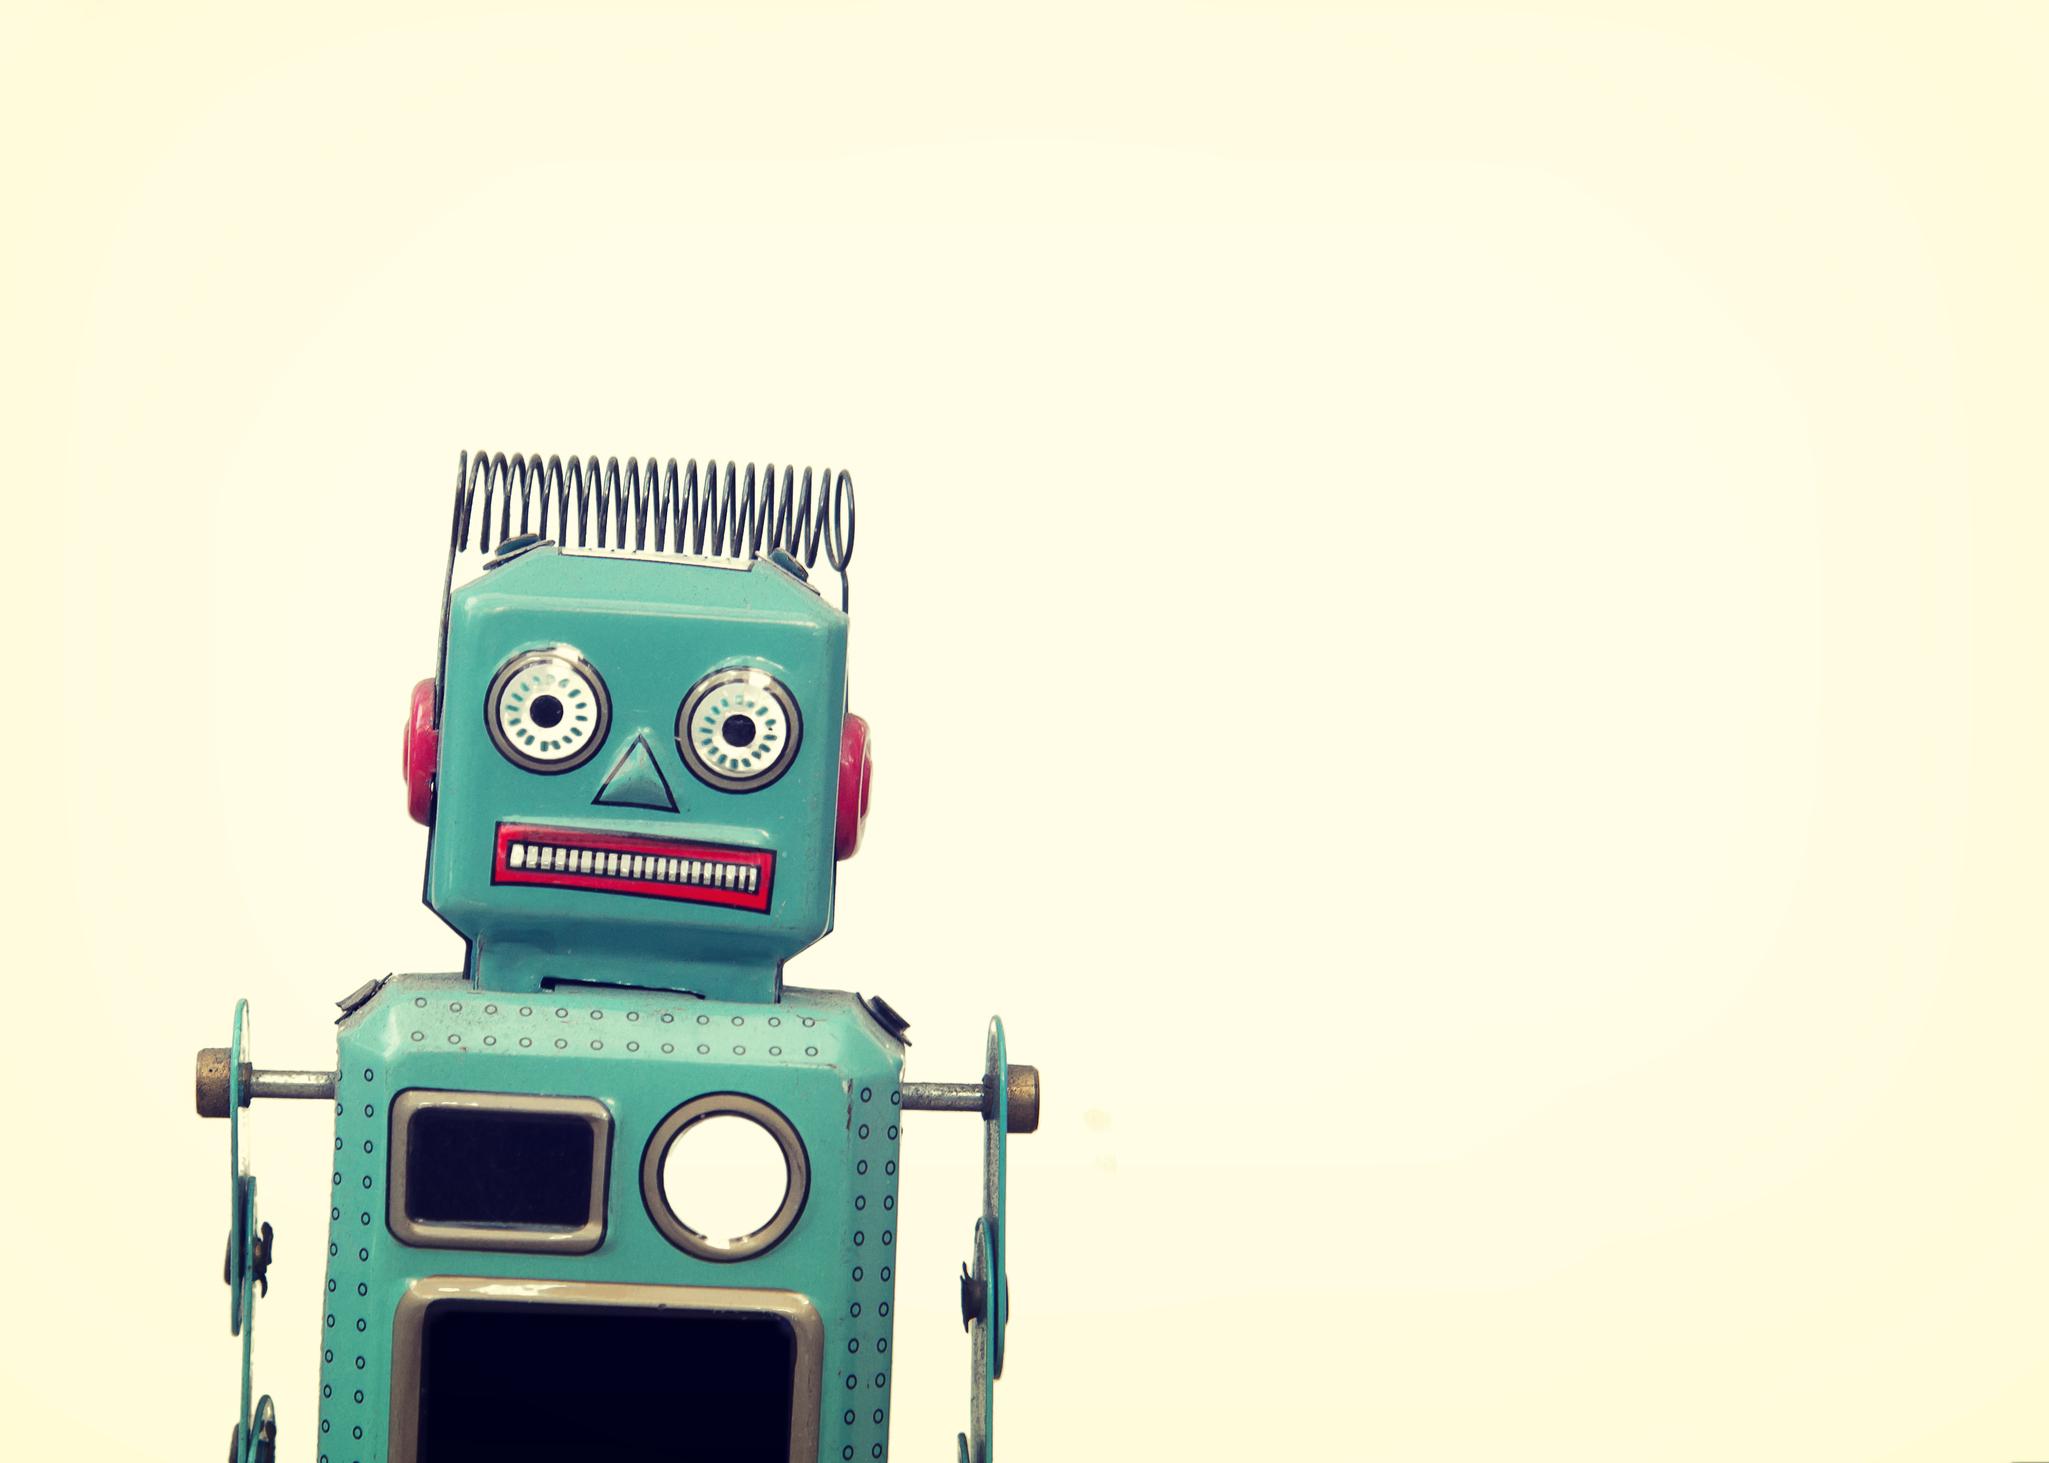 Robotica | Cybernetics | Medische Zorgrobots | Contracten | ISO ANSI IEC 62443-norm | Medical Device